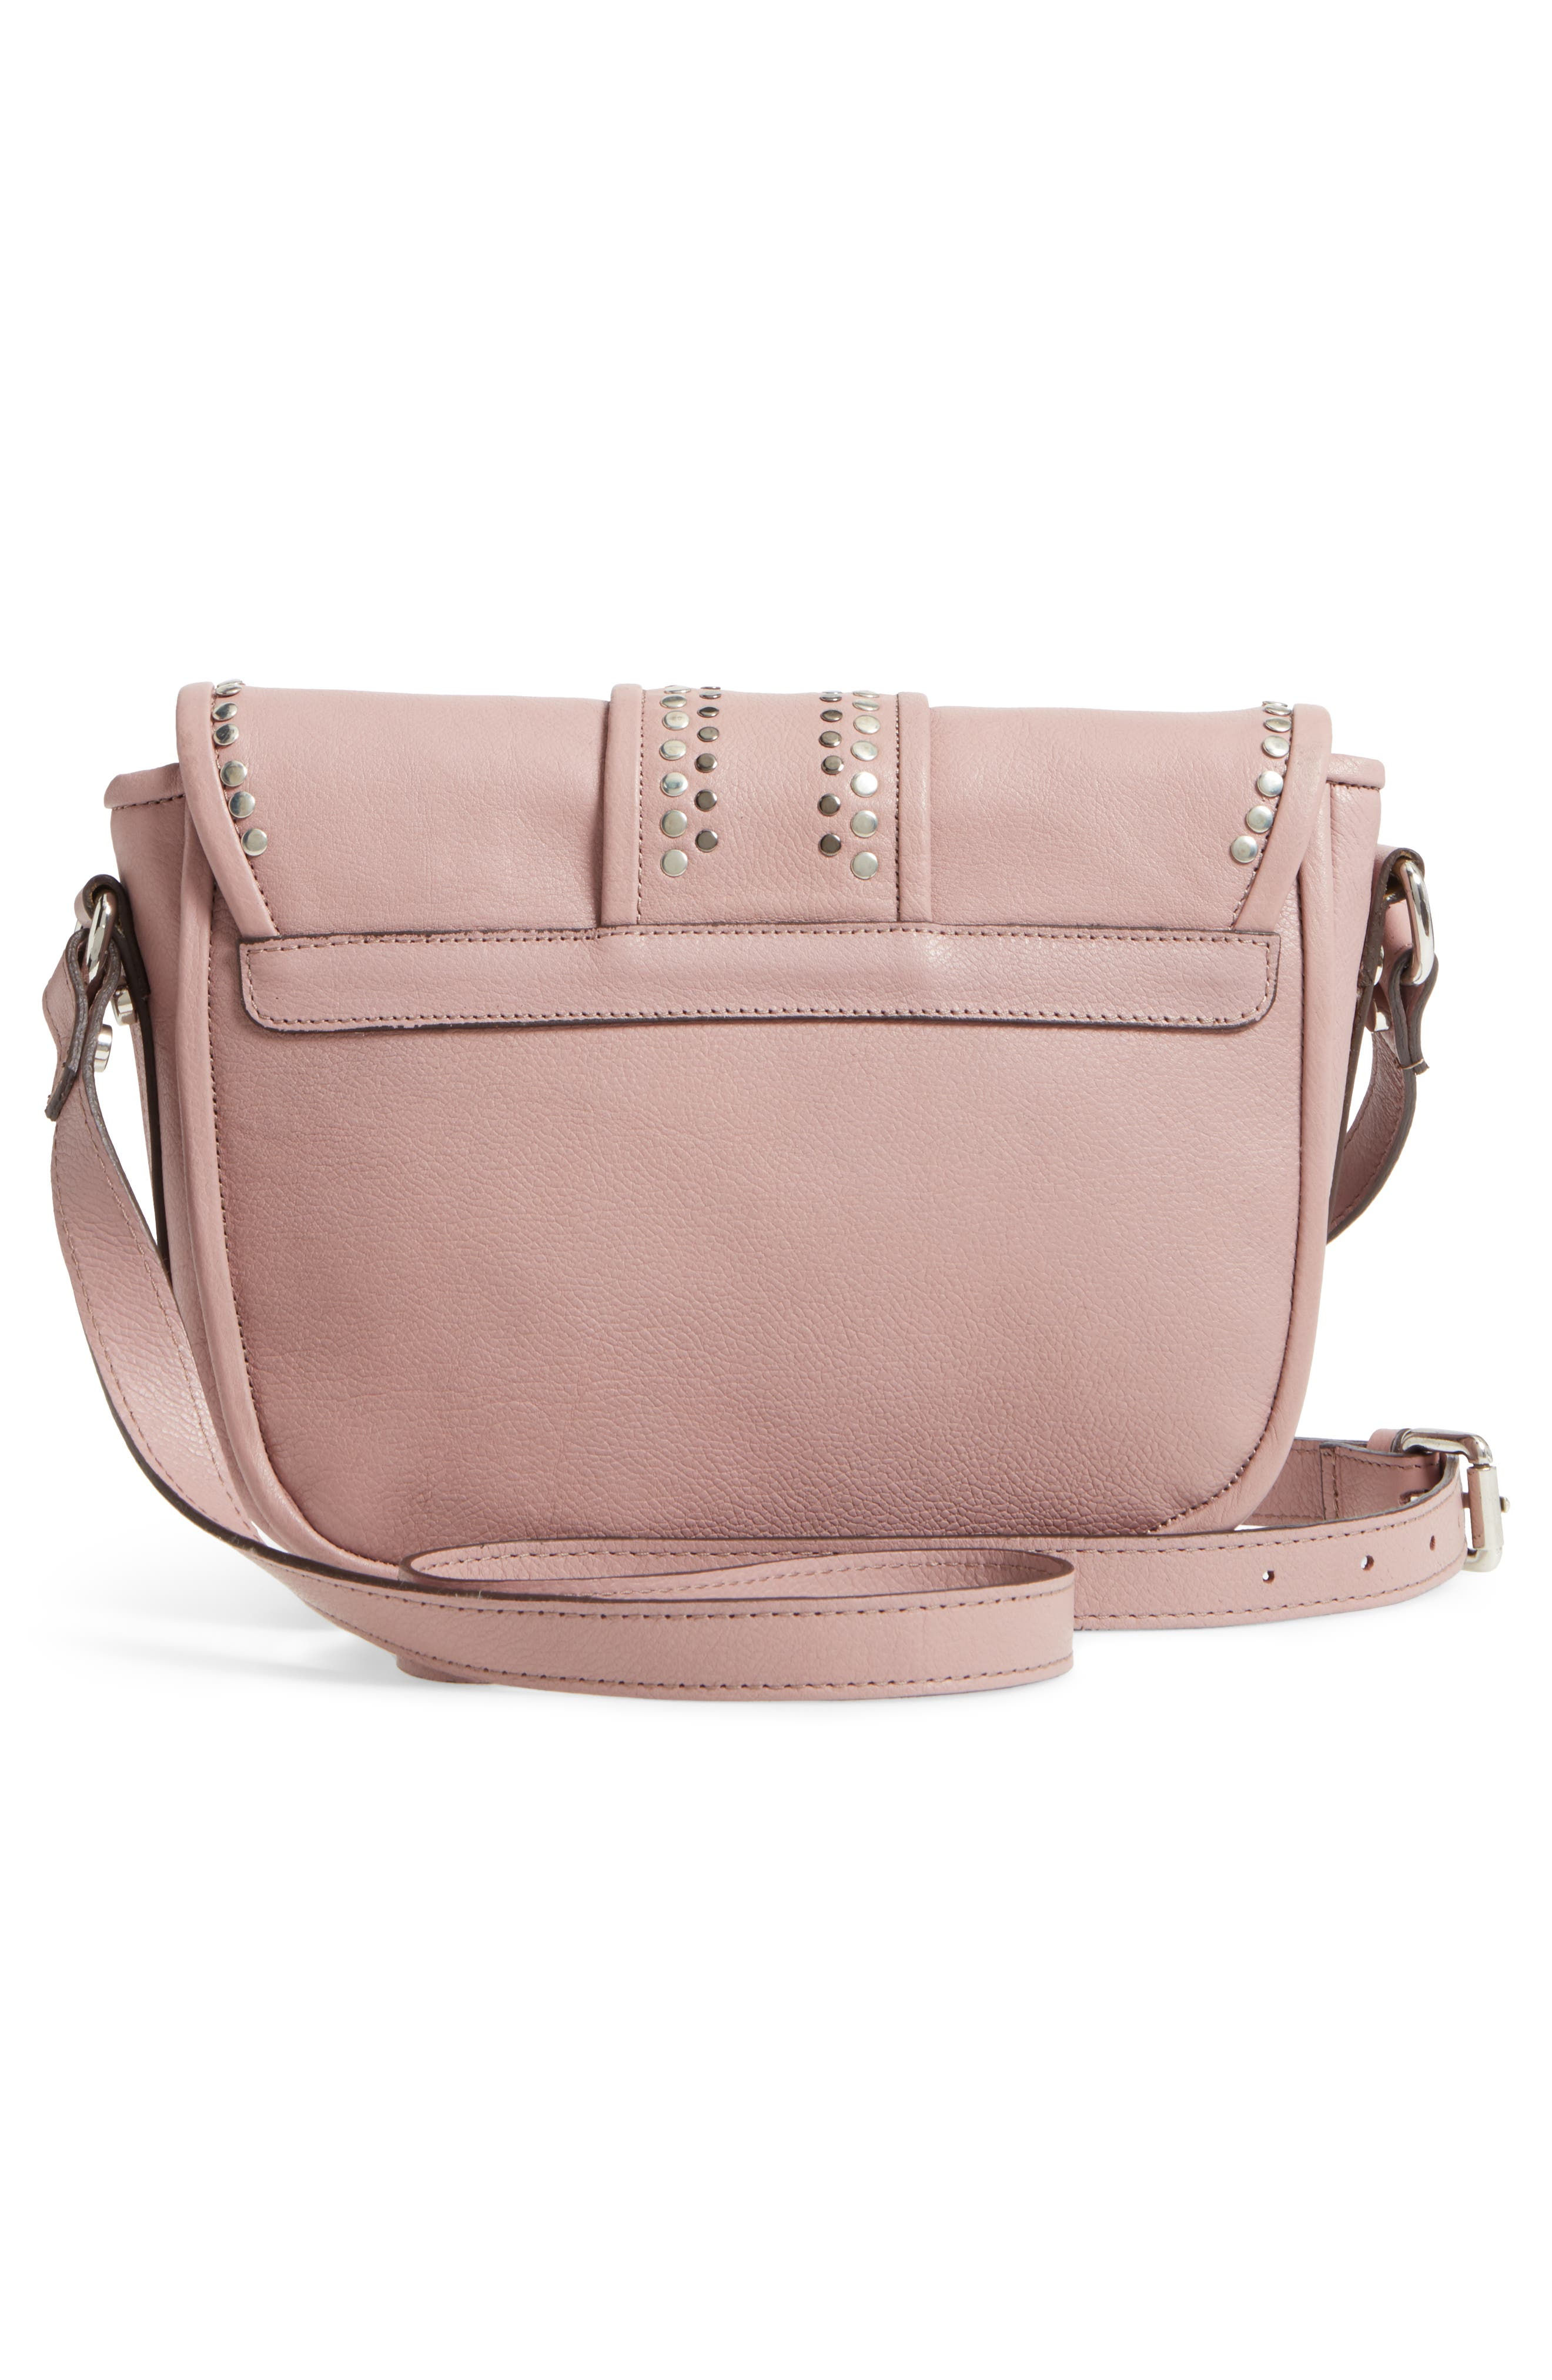 Premium Leather Studded Shoulder Bag,                             Alternate thumbnail 4, color,                             Blush